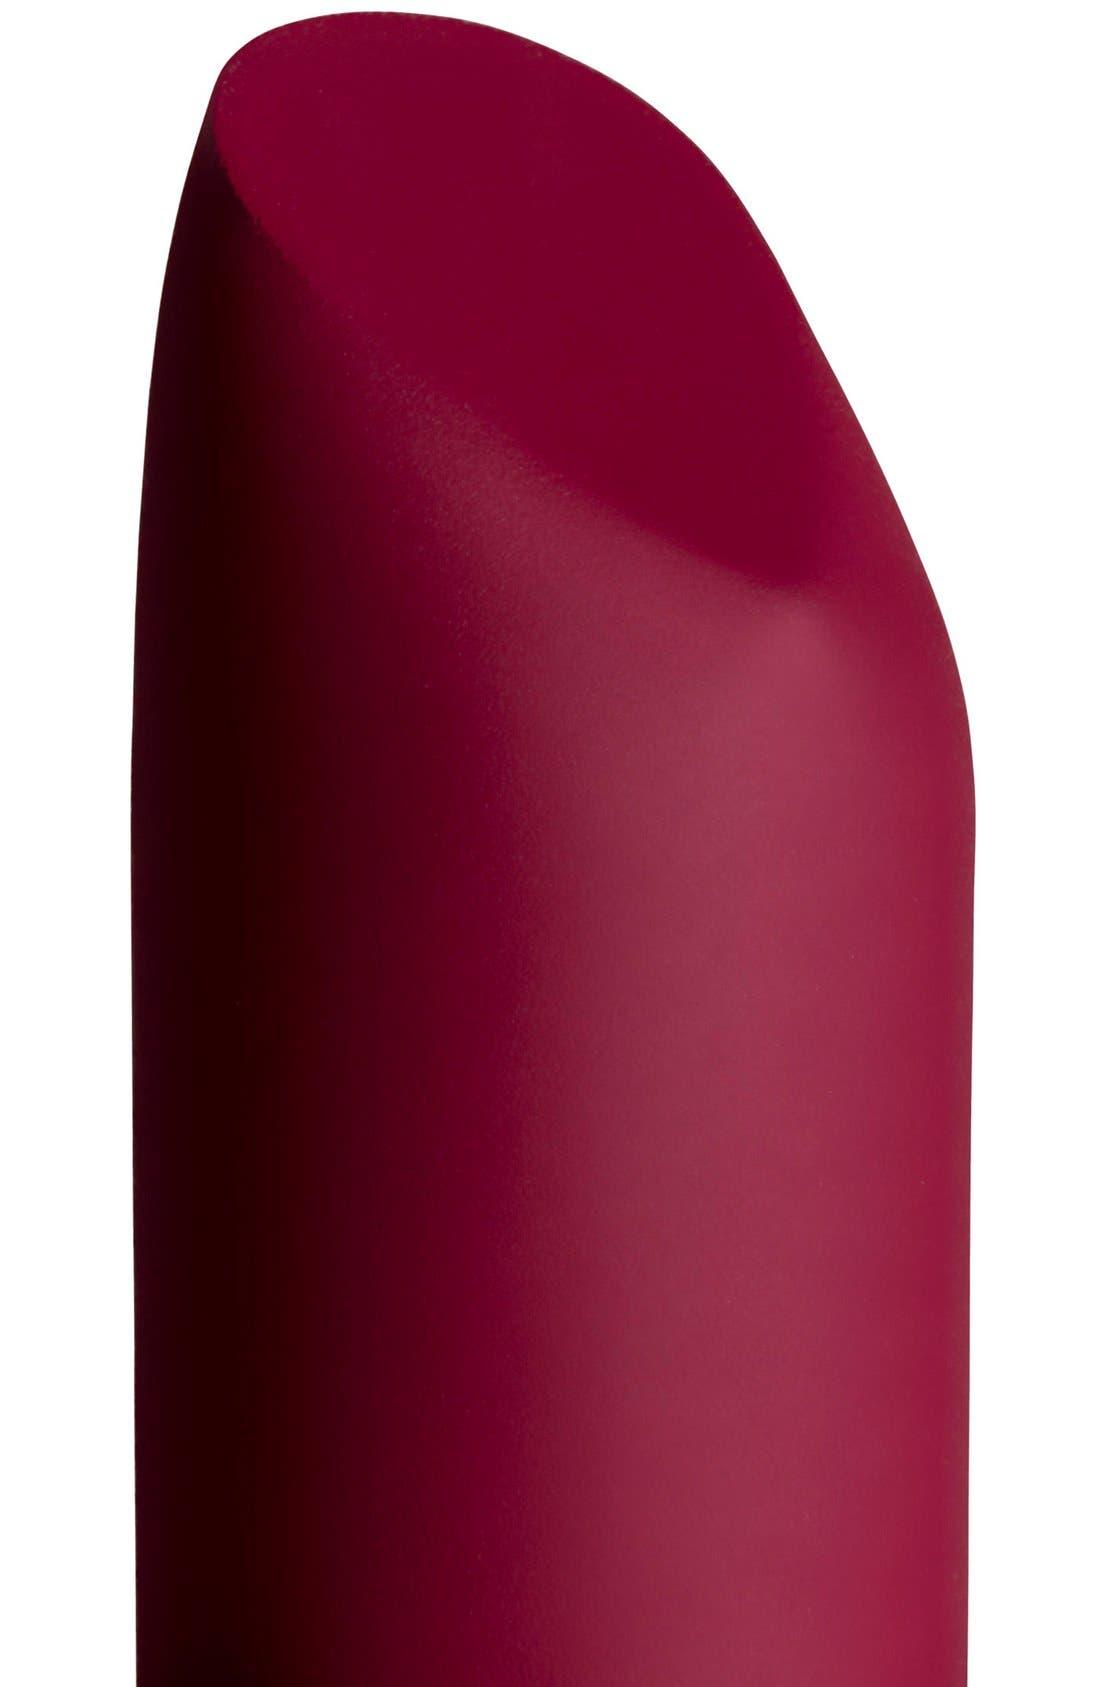 Rouge Louboutin Velvet Matte Lip Colour,                             Alternate thumbnail 41, color,